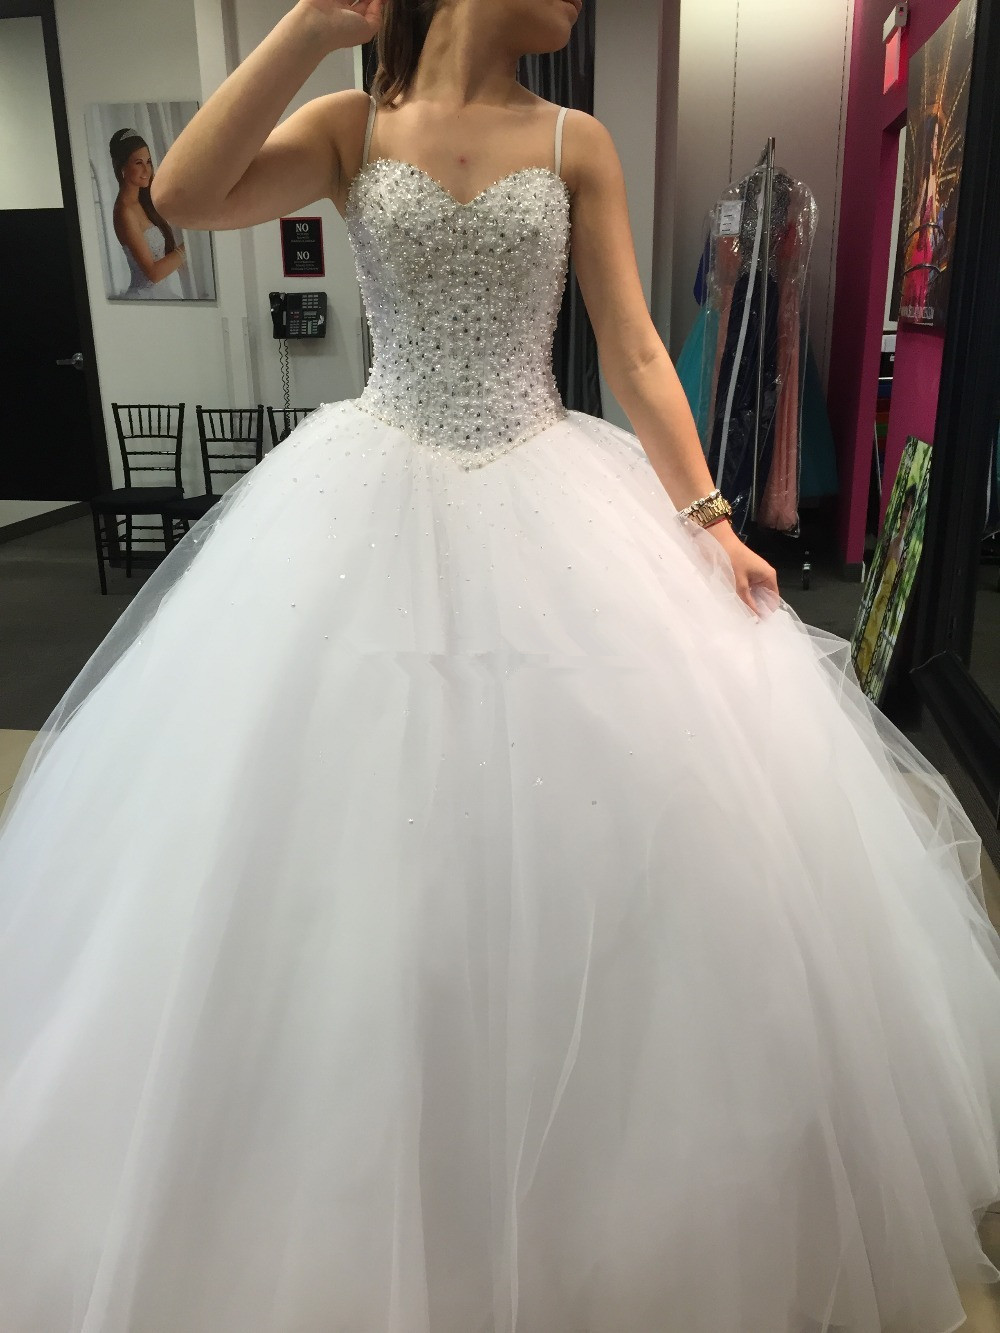 cinderella style wedding dresses photo - 1